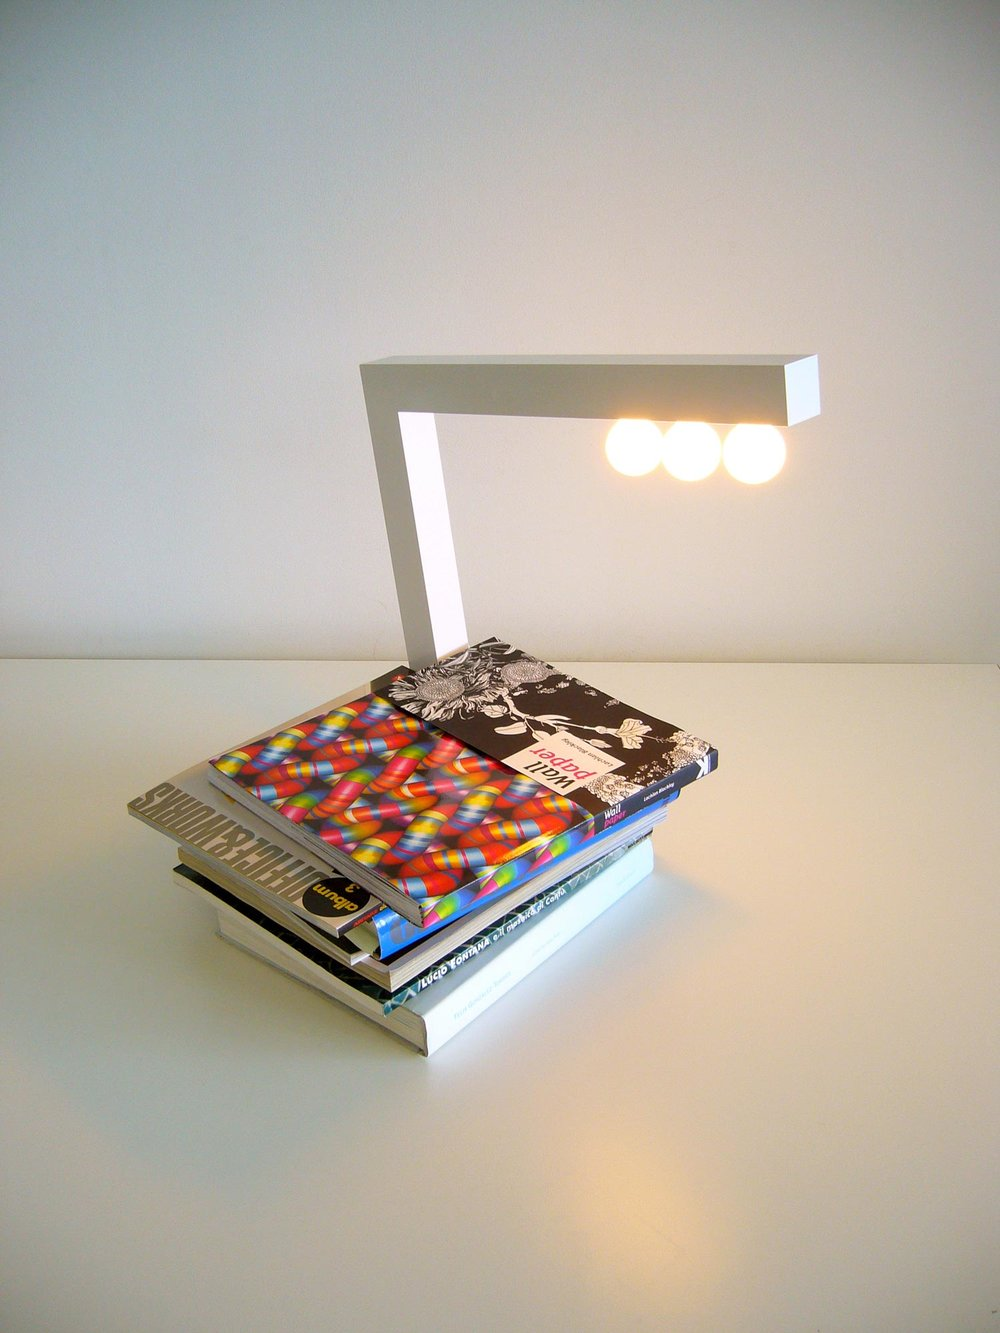 ooo_lamp 02.jpg